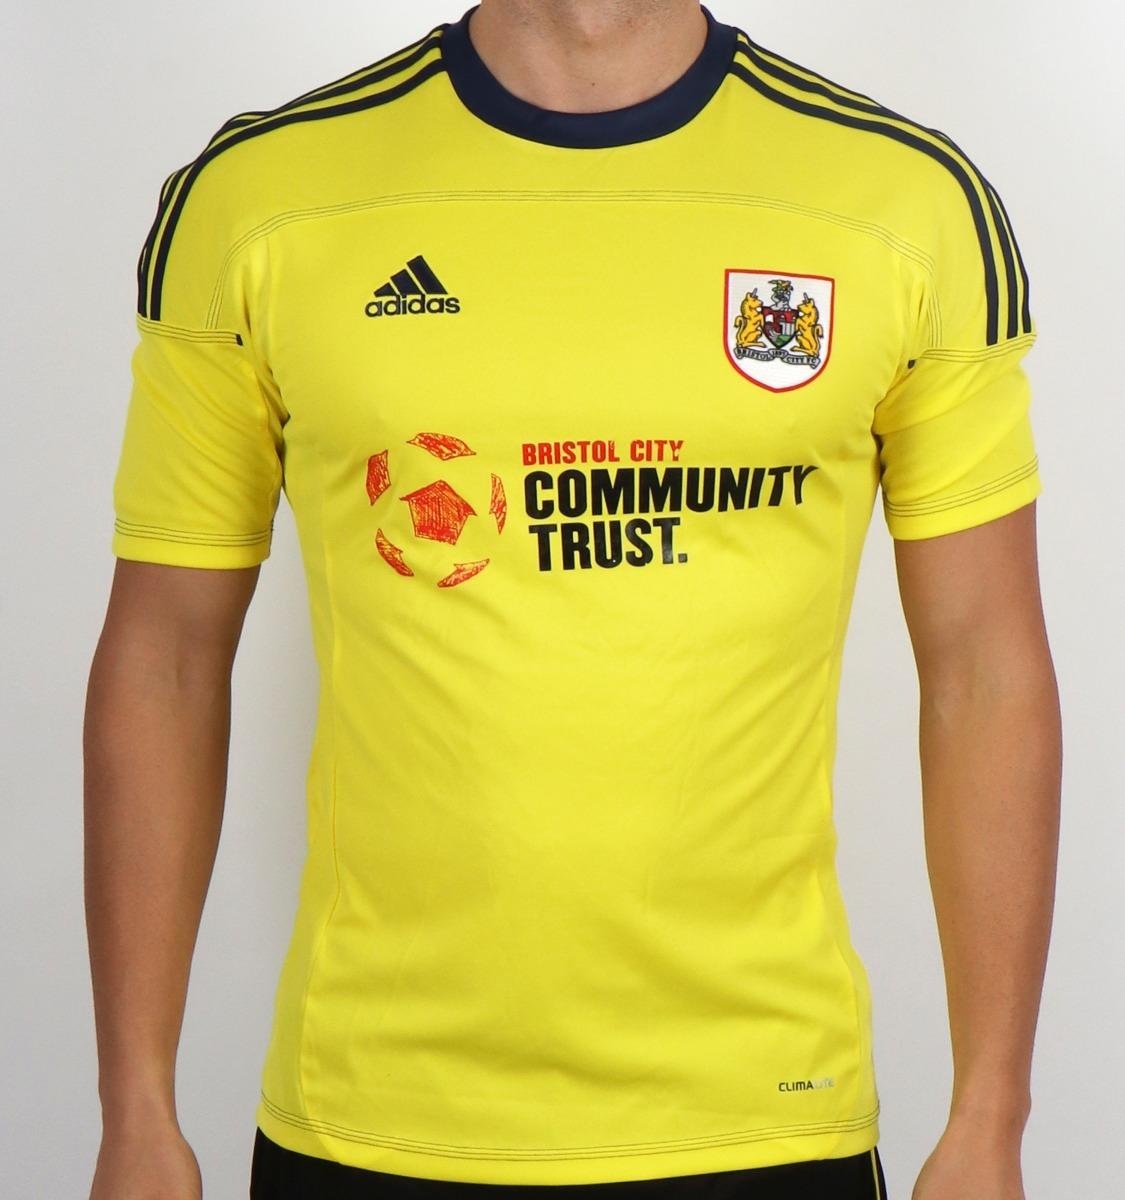 Camisa Bristol City Football Club adidas 2011 12 Inglaterra - R  99 ... 333bfcdcc1170